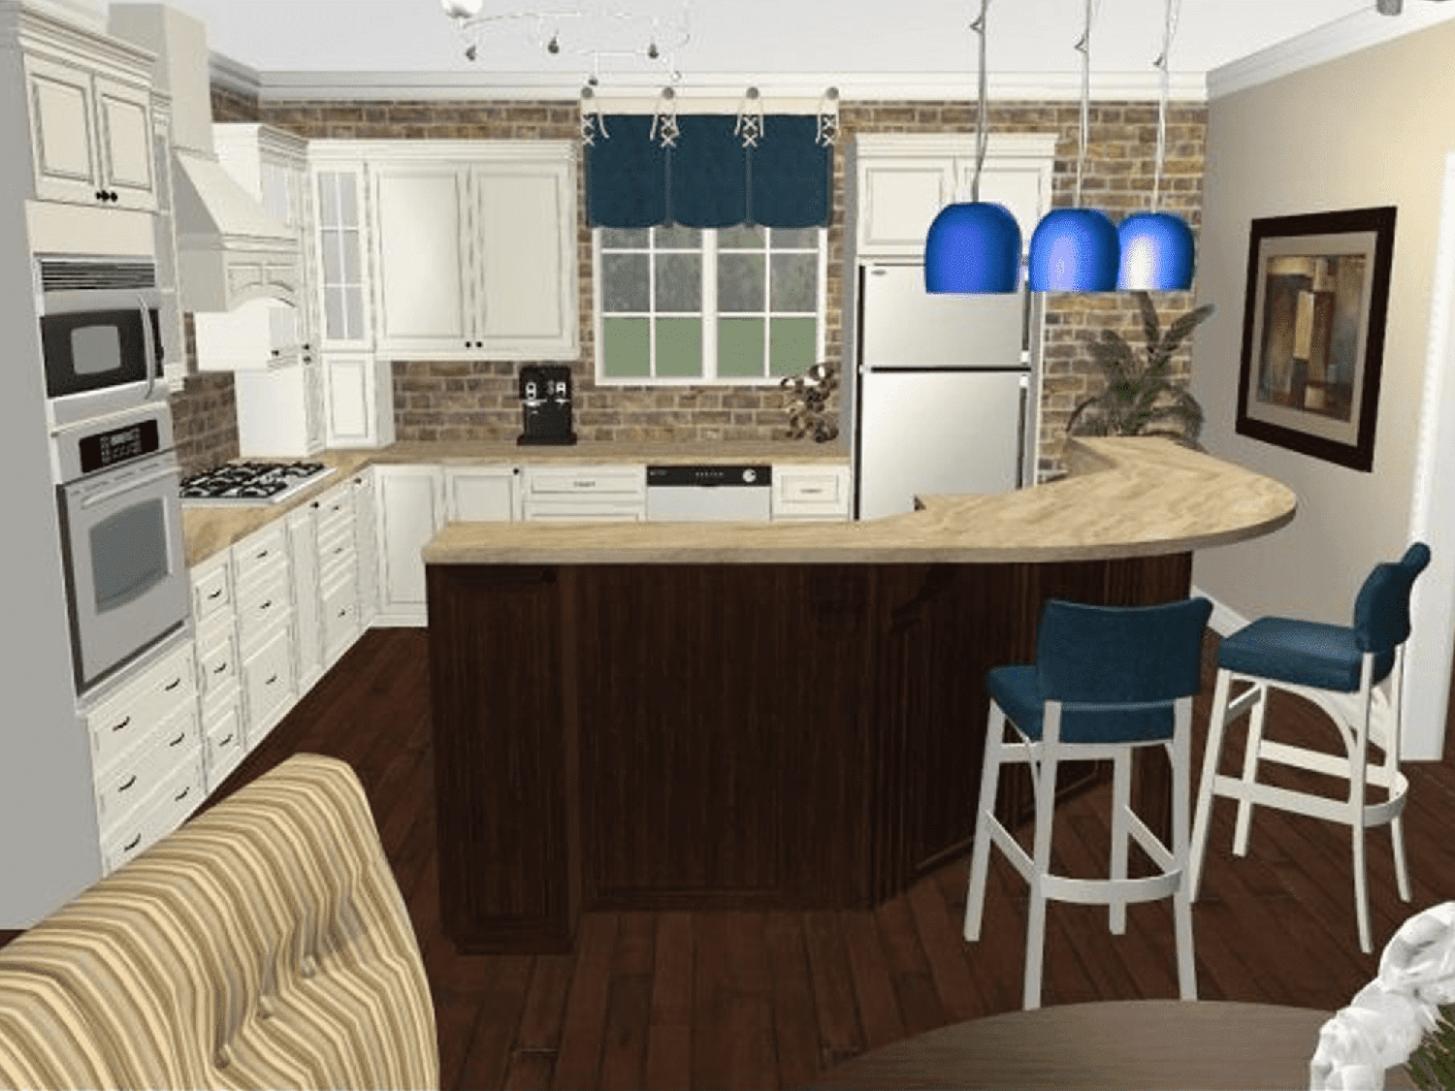 Free Online Room Design Software Applications - Apartment Design Tool Online